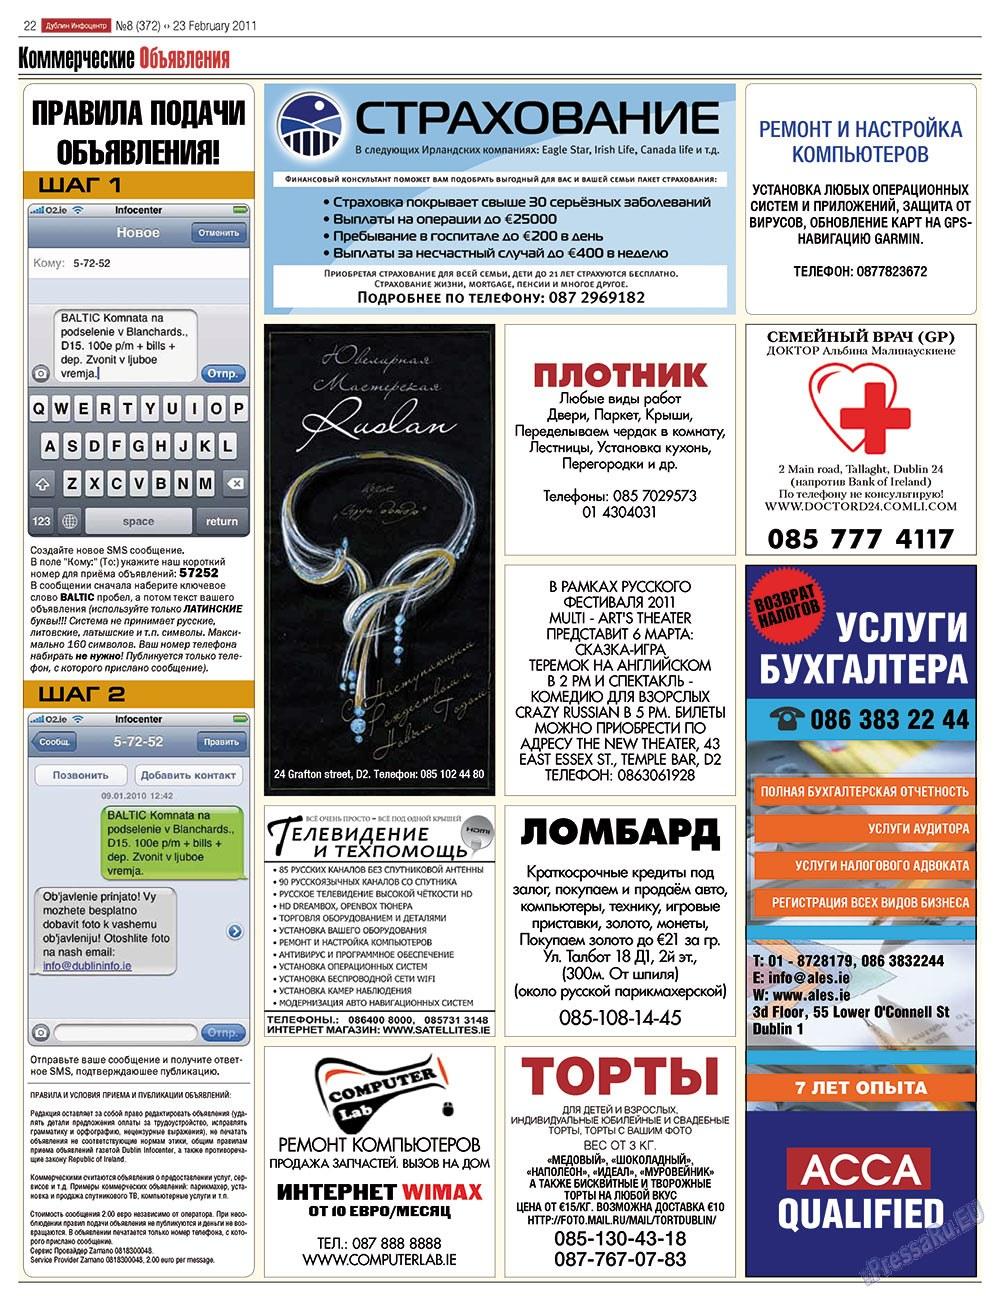 Дублин инфоцентр (газета). 2011 год, номер 8, стр. 22